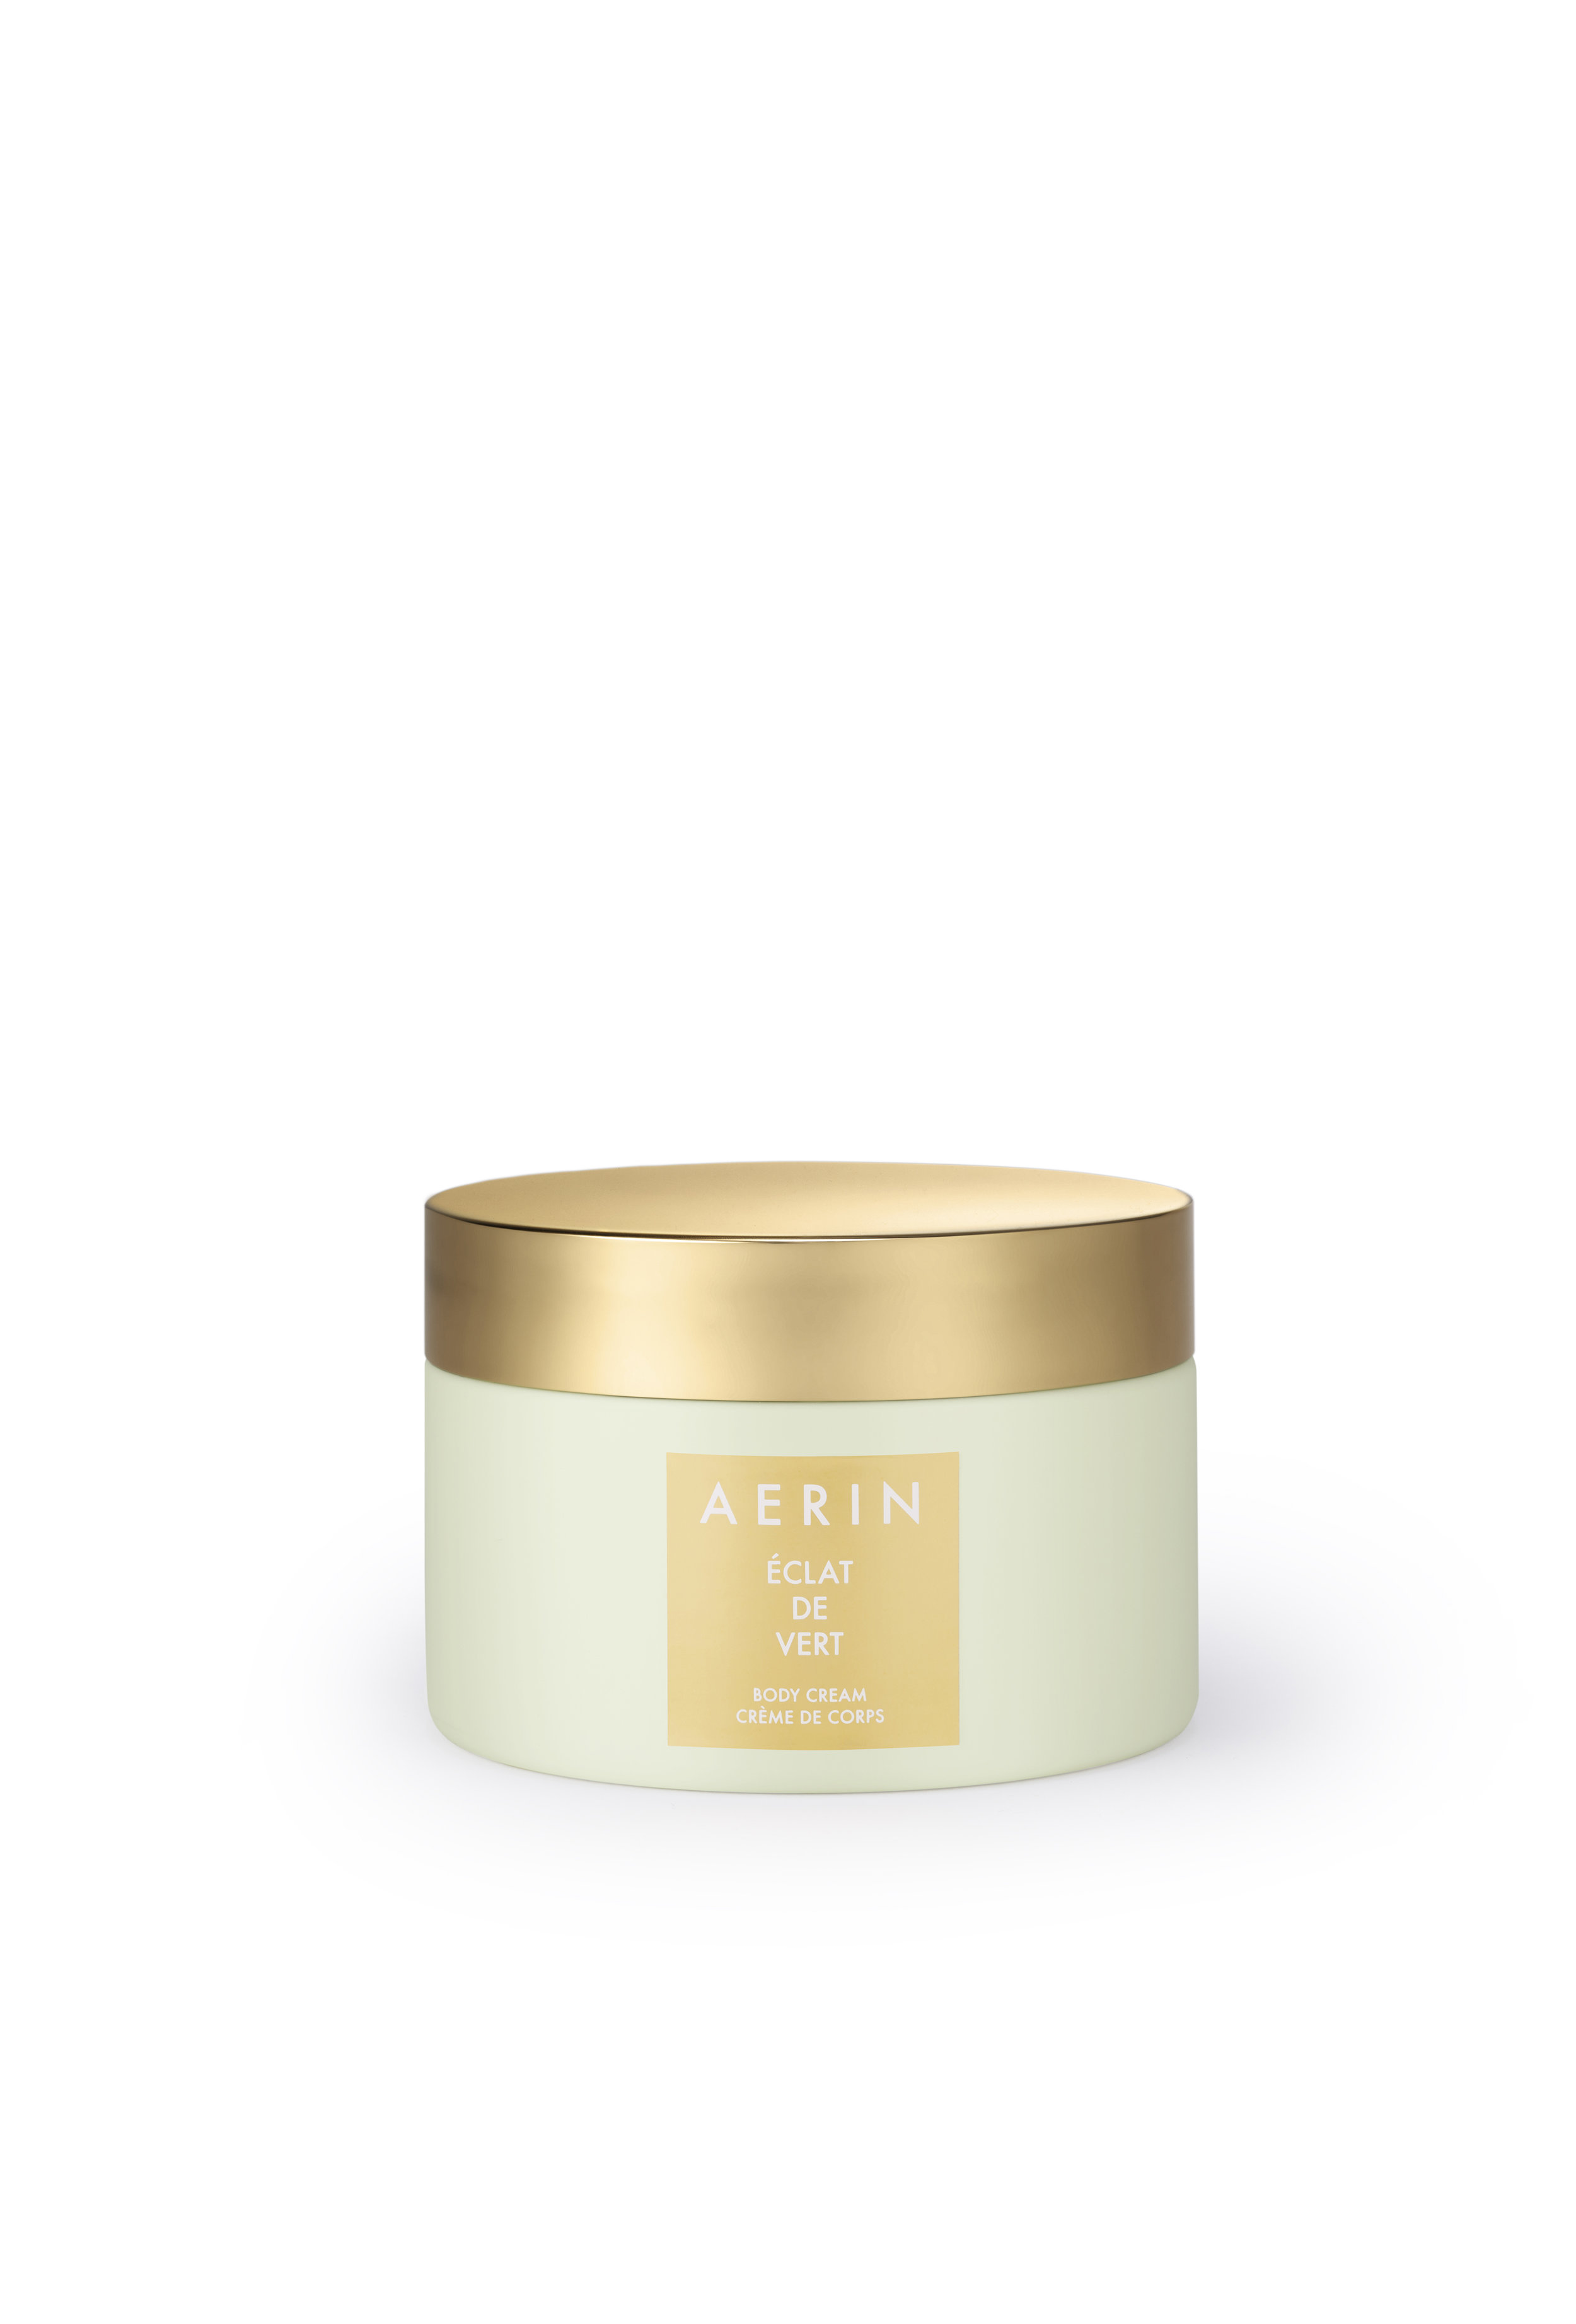 AERIN E¦Çclat de Vert Body Cream_Product on White_Global_No Expiry.jpg